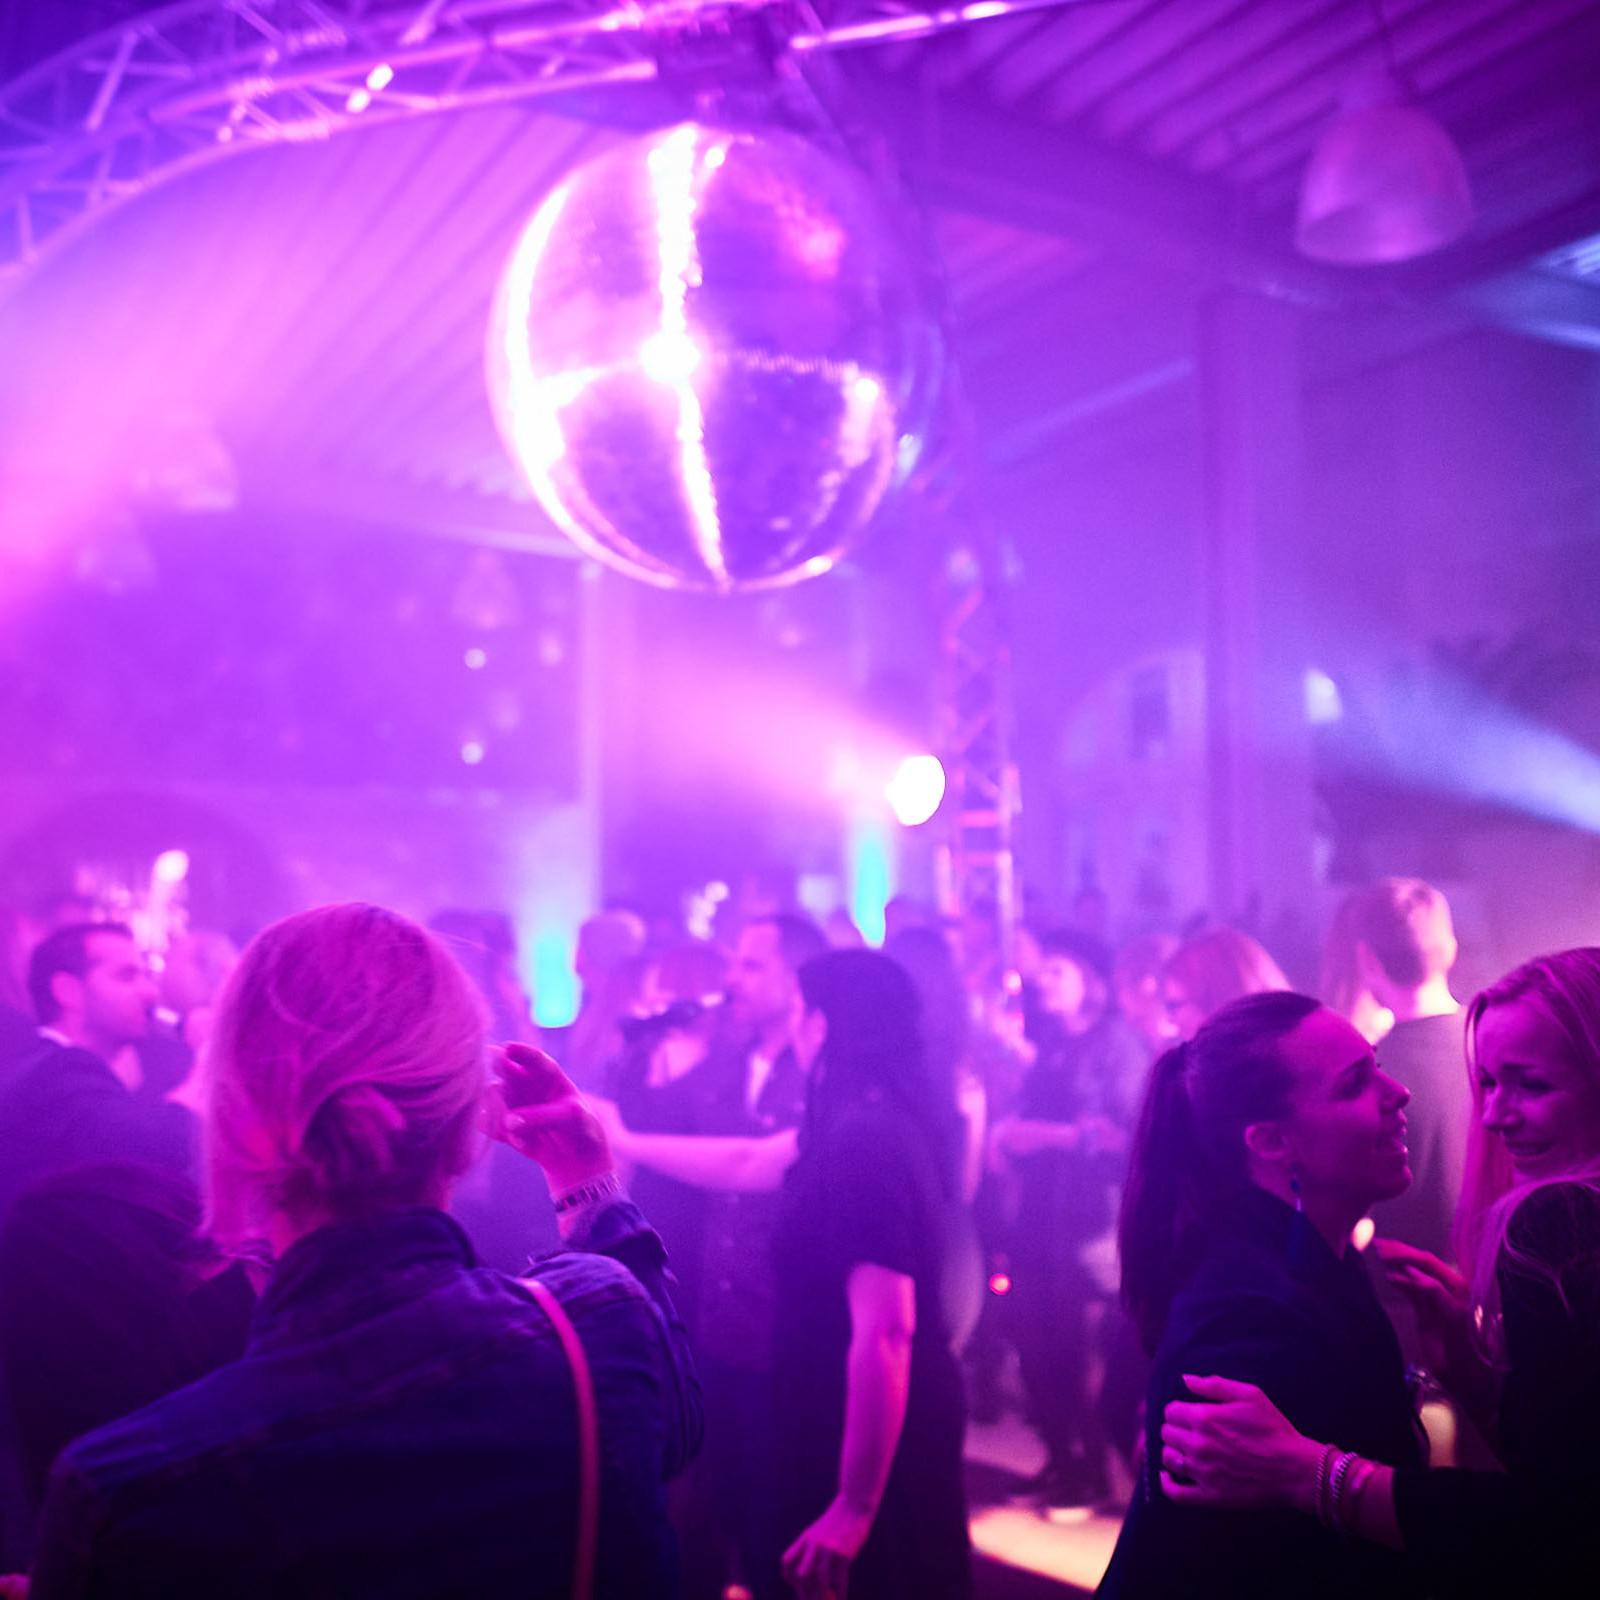 DJane | DJ | Hannover | Glitzerplatte | Club | Lounge | Empfang | Wedding | Event | Messe | Charity | Gala | Buchen | Mieten